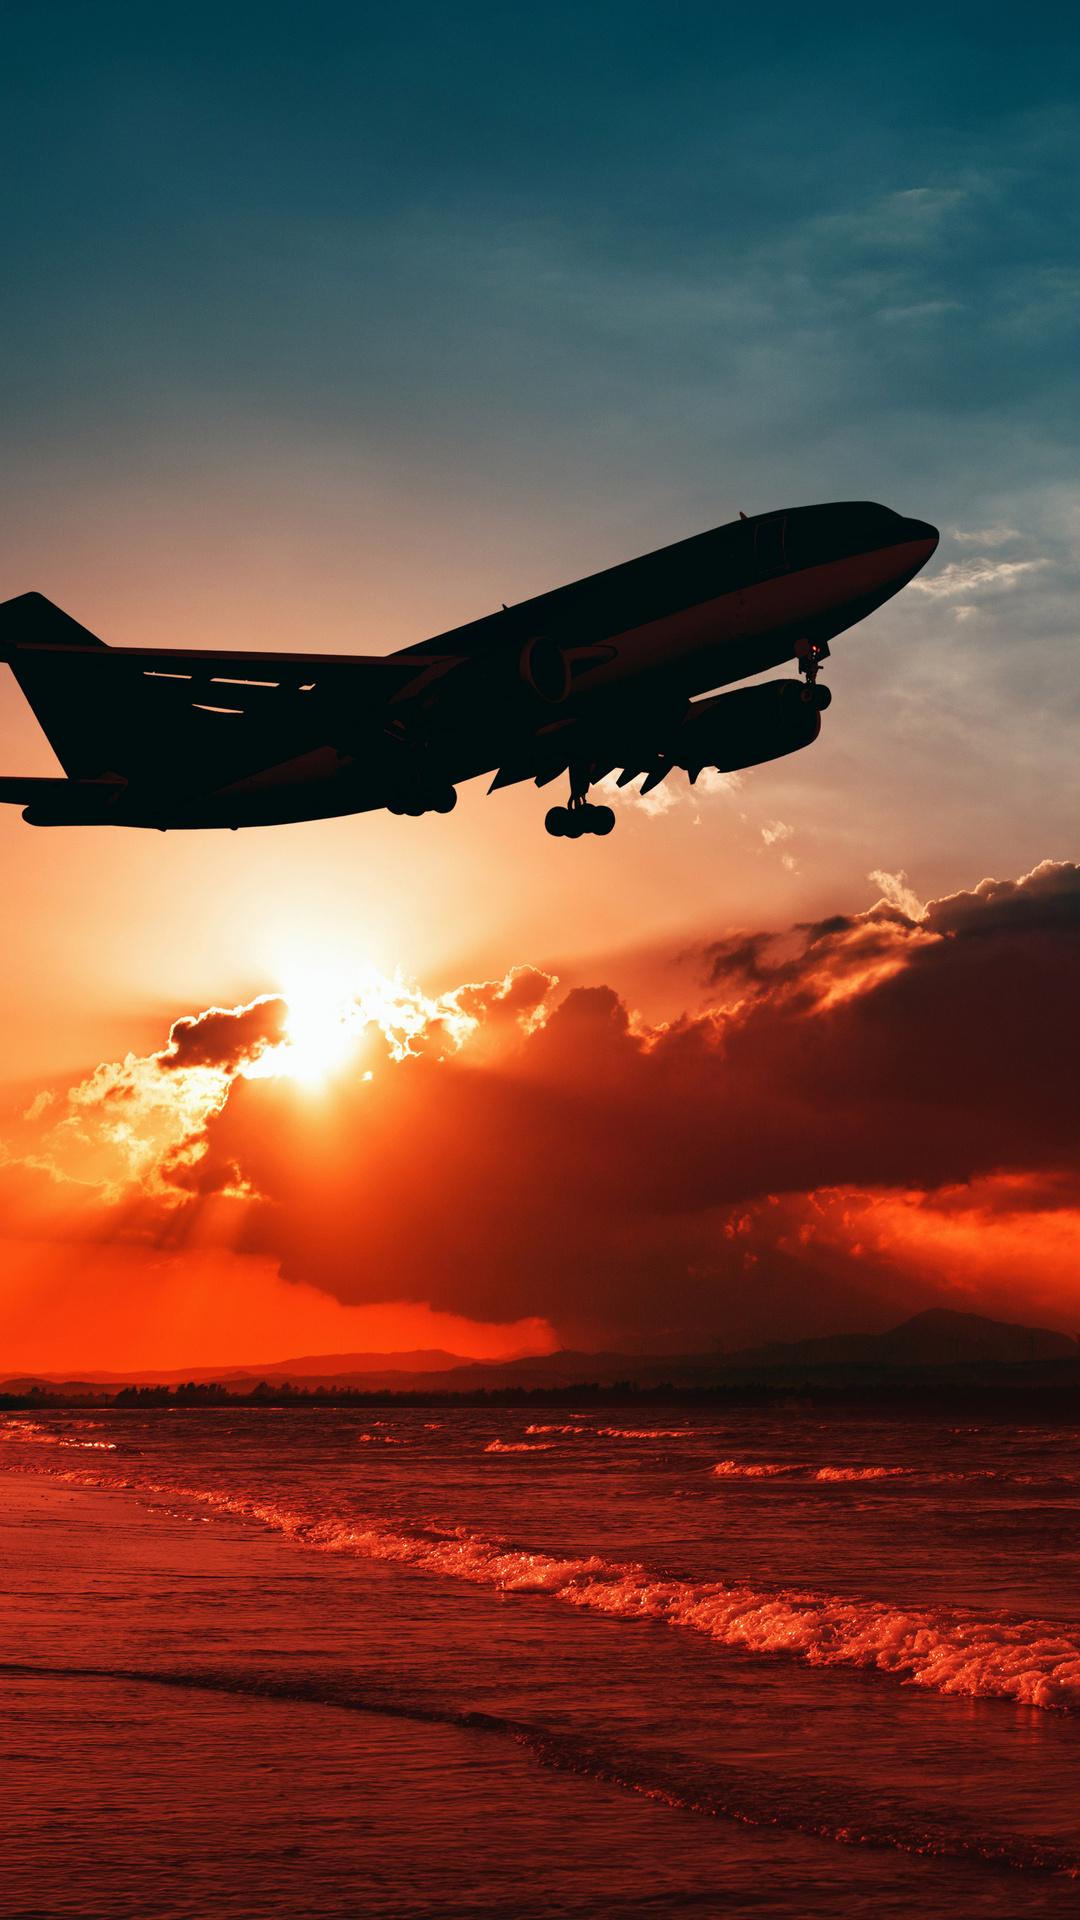 1080x1920 Airplane Flying Over Beach Shore Sunset 5k ...